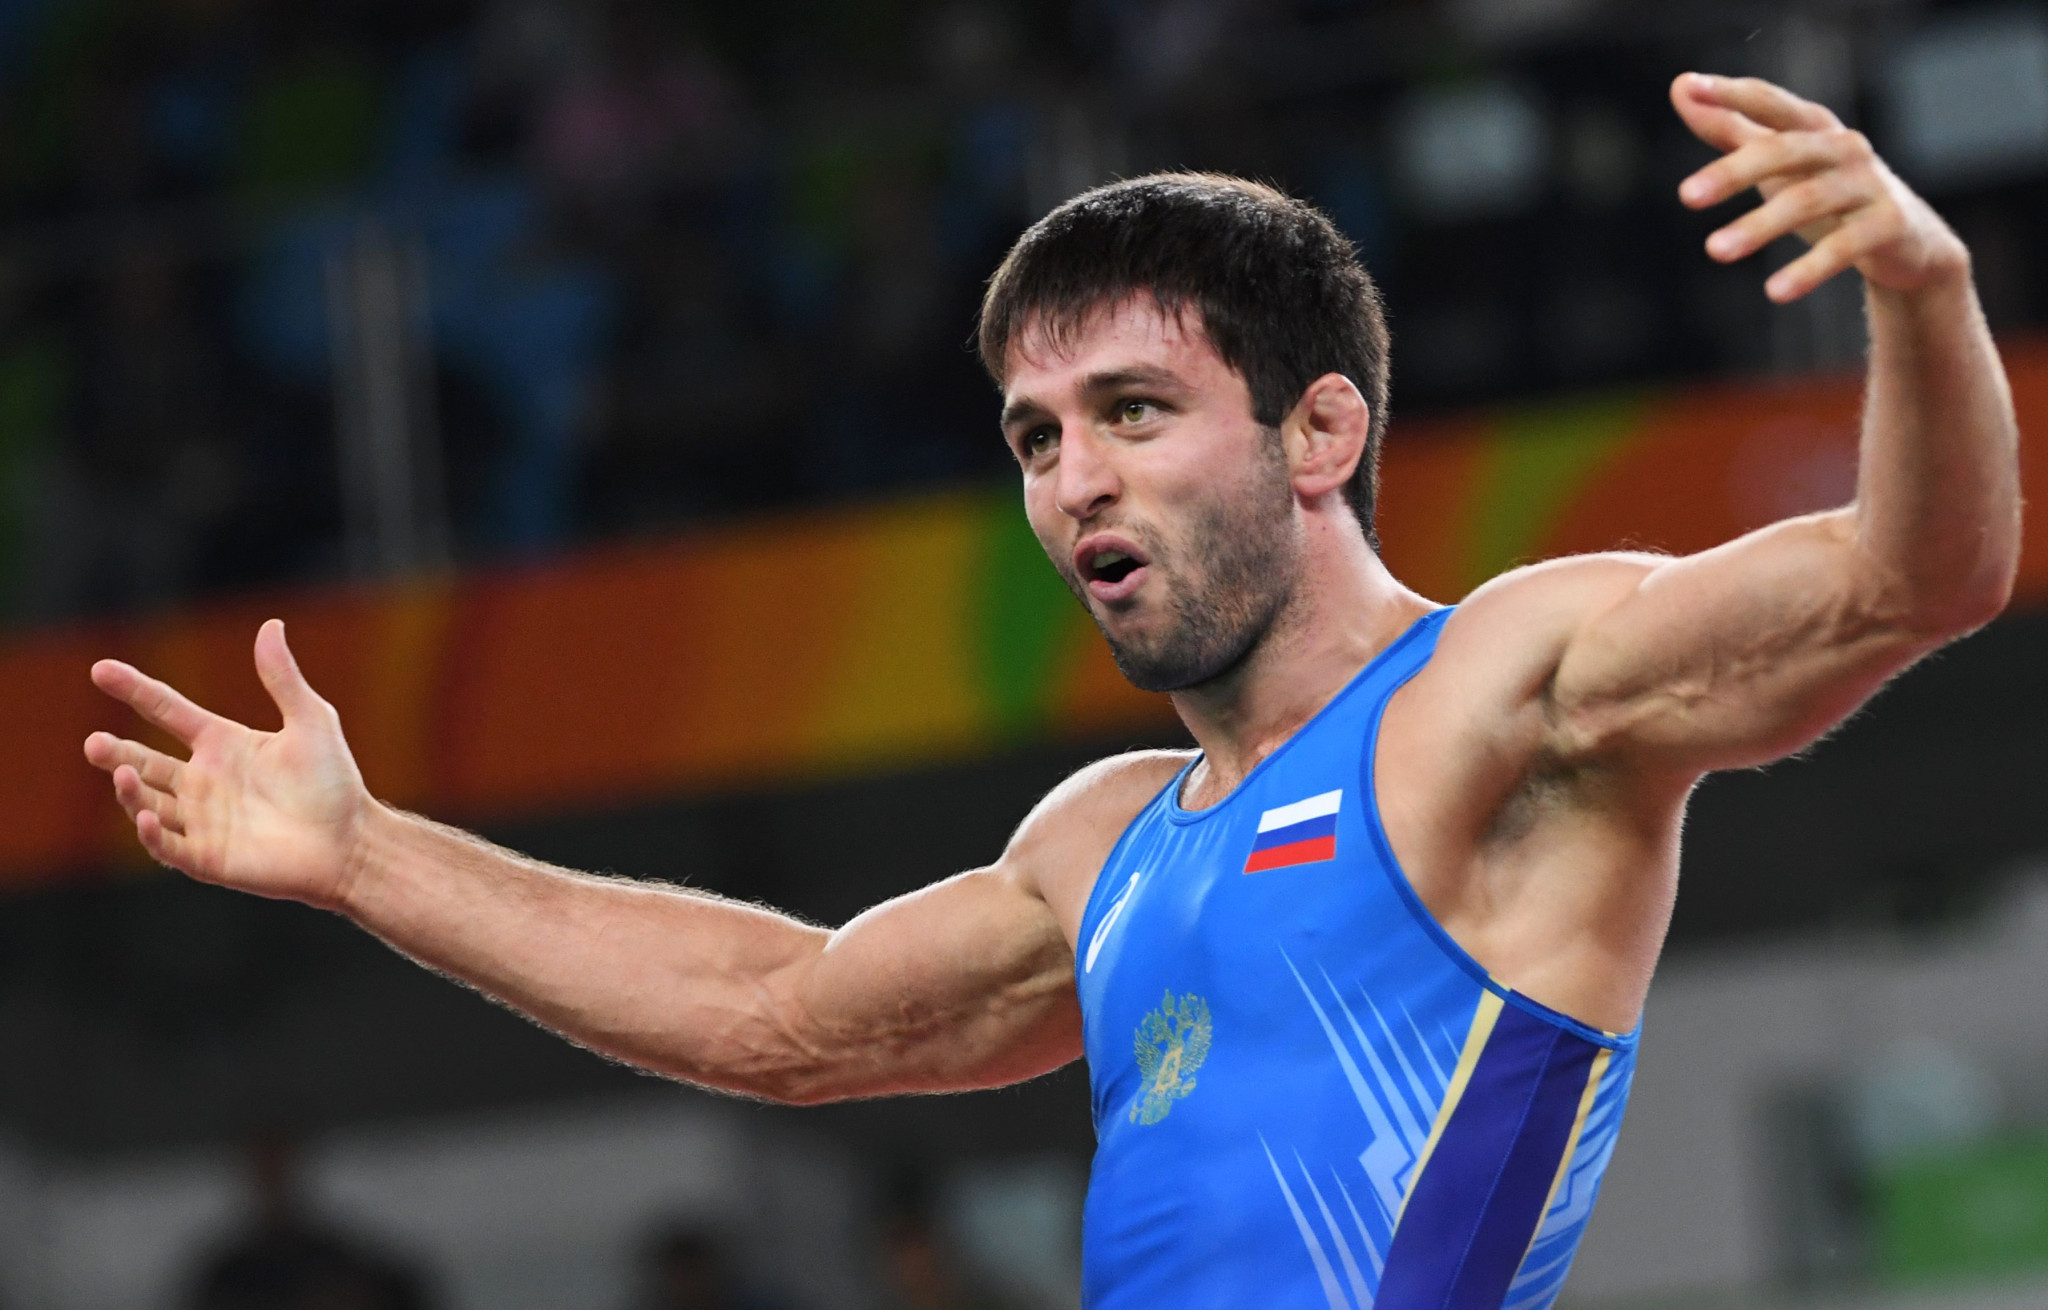 Olympic wrestling champion Ramonov to miss Tokyo 2020 following knee surgery